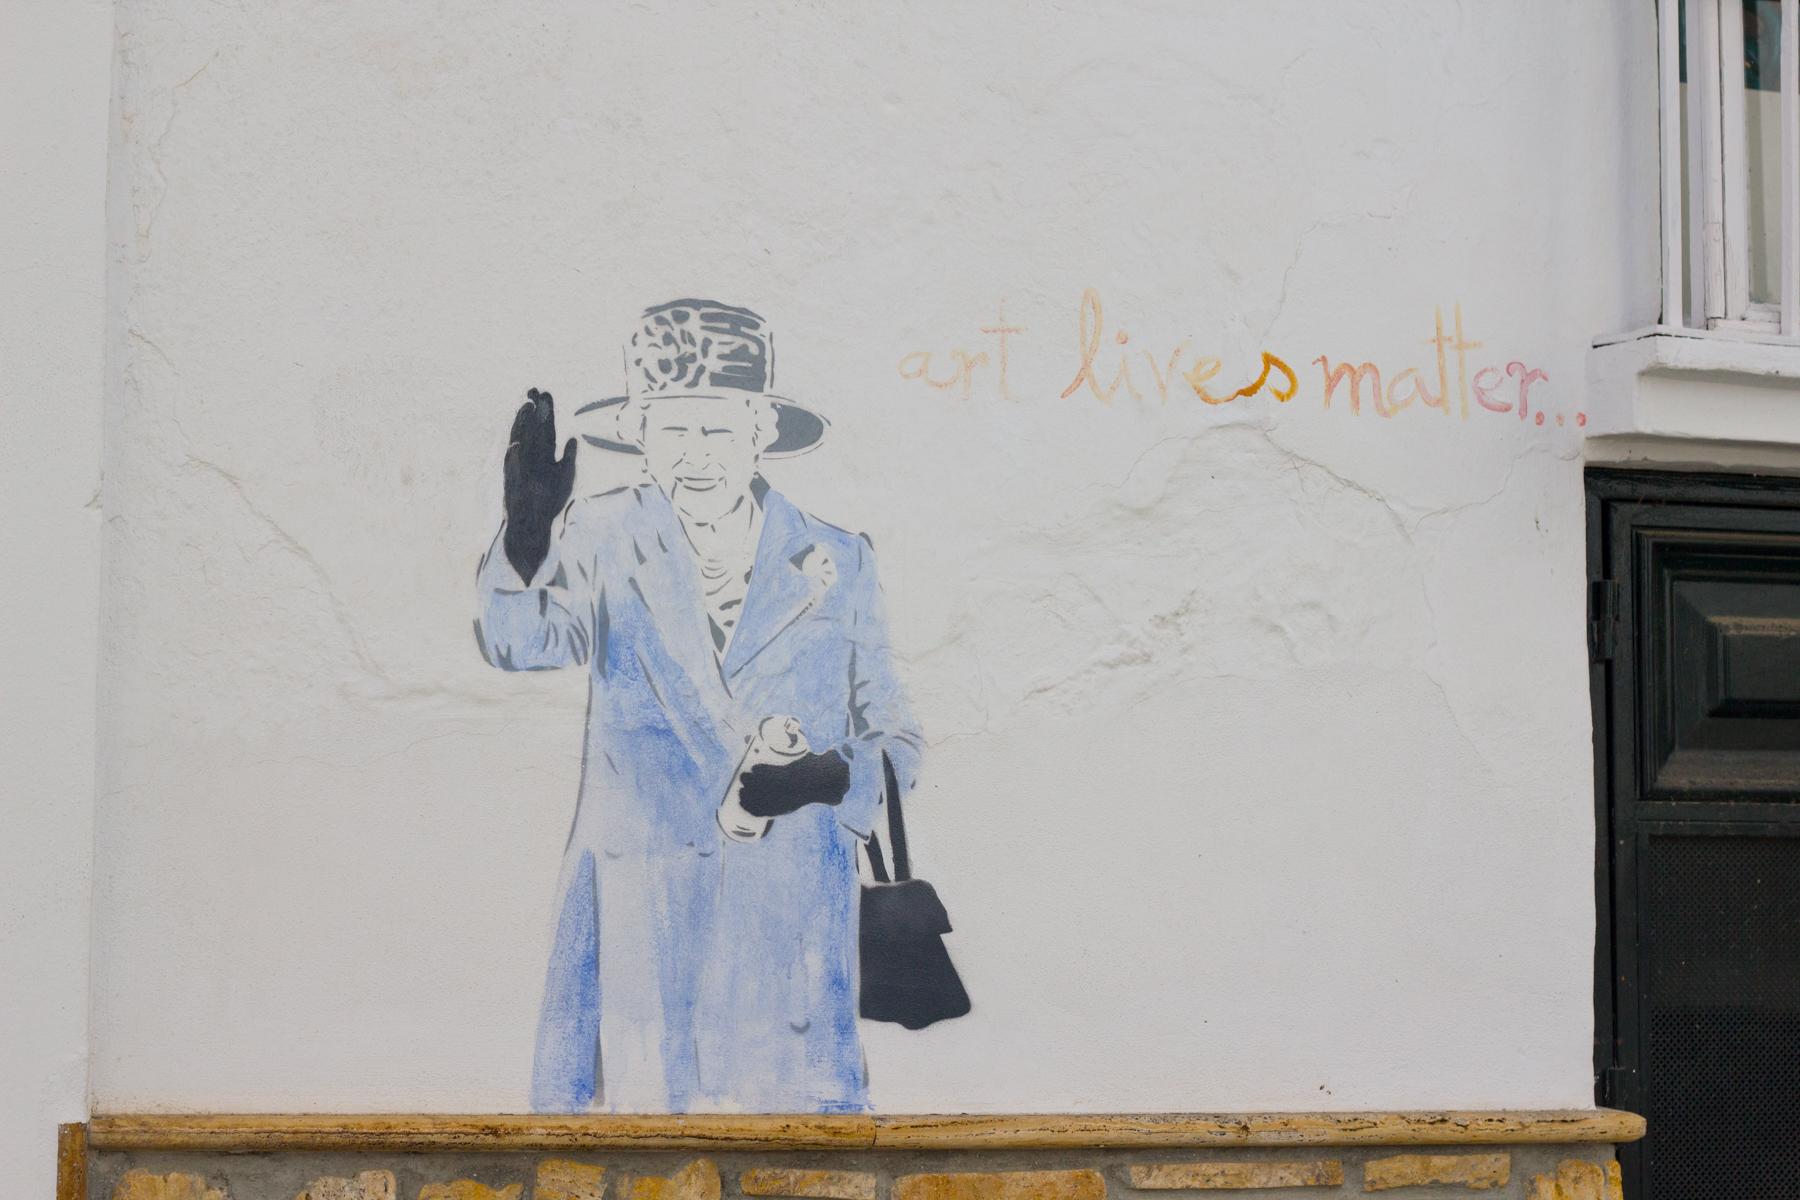 Street art in Competa